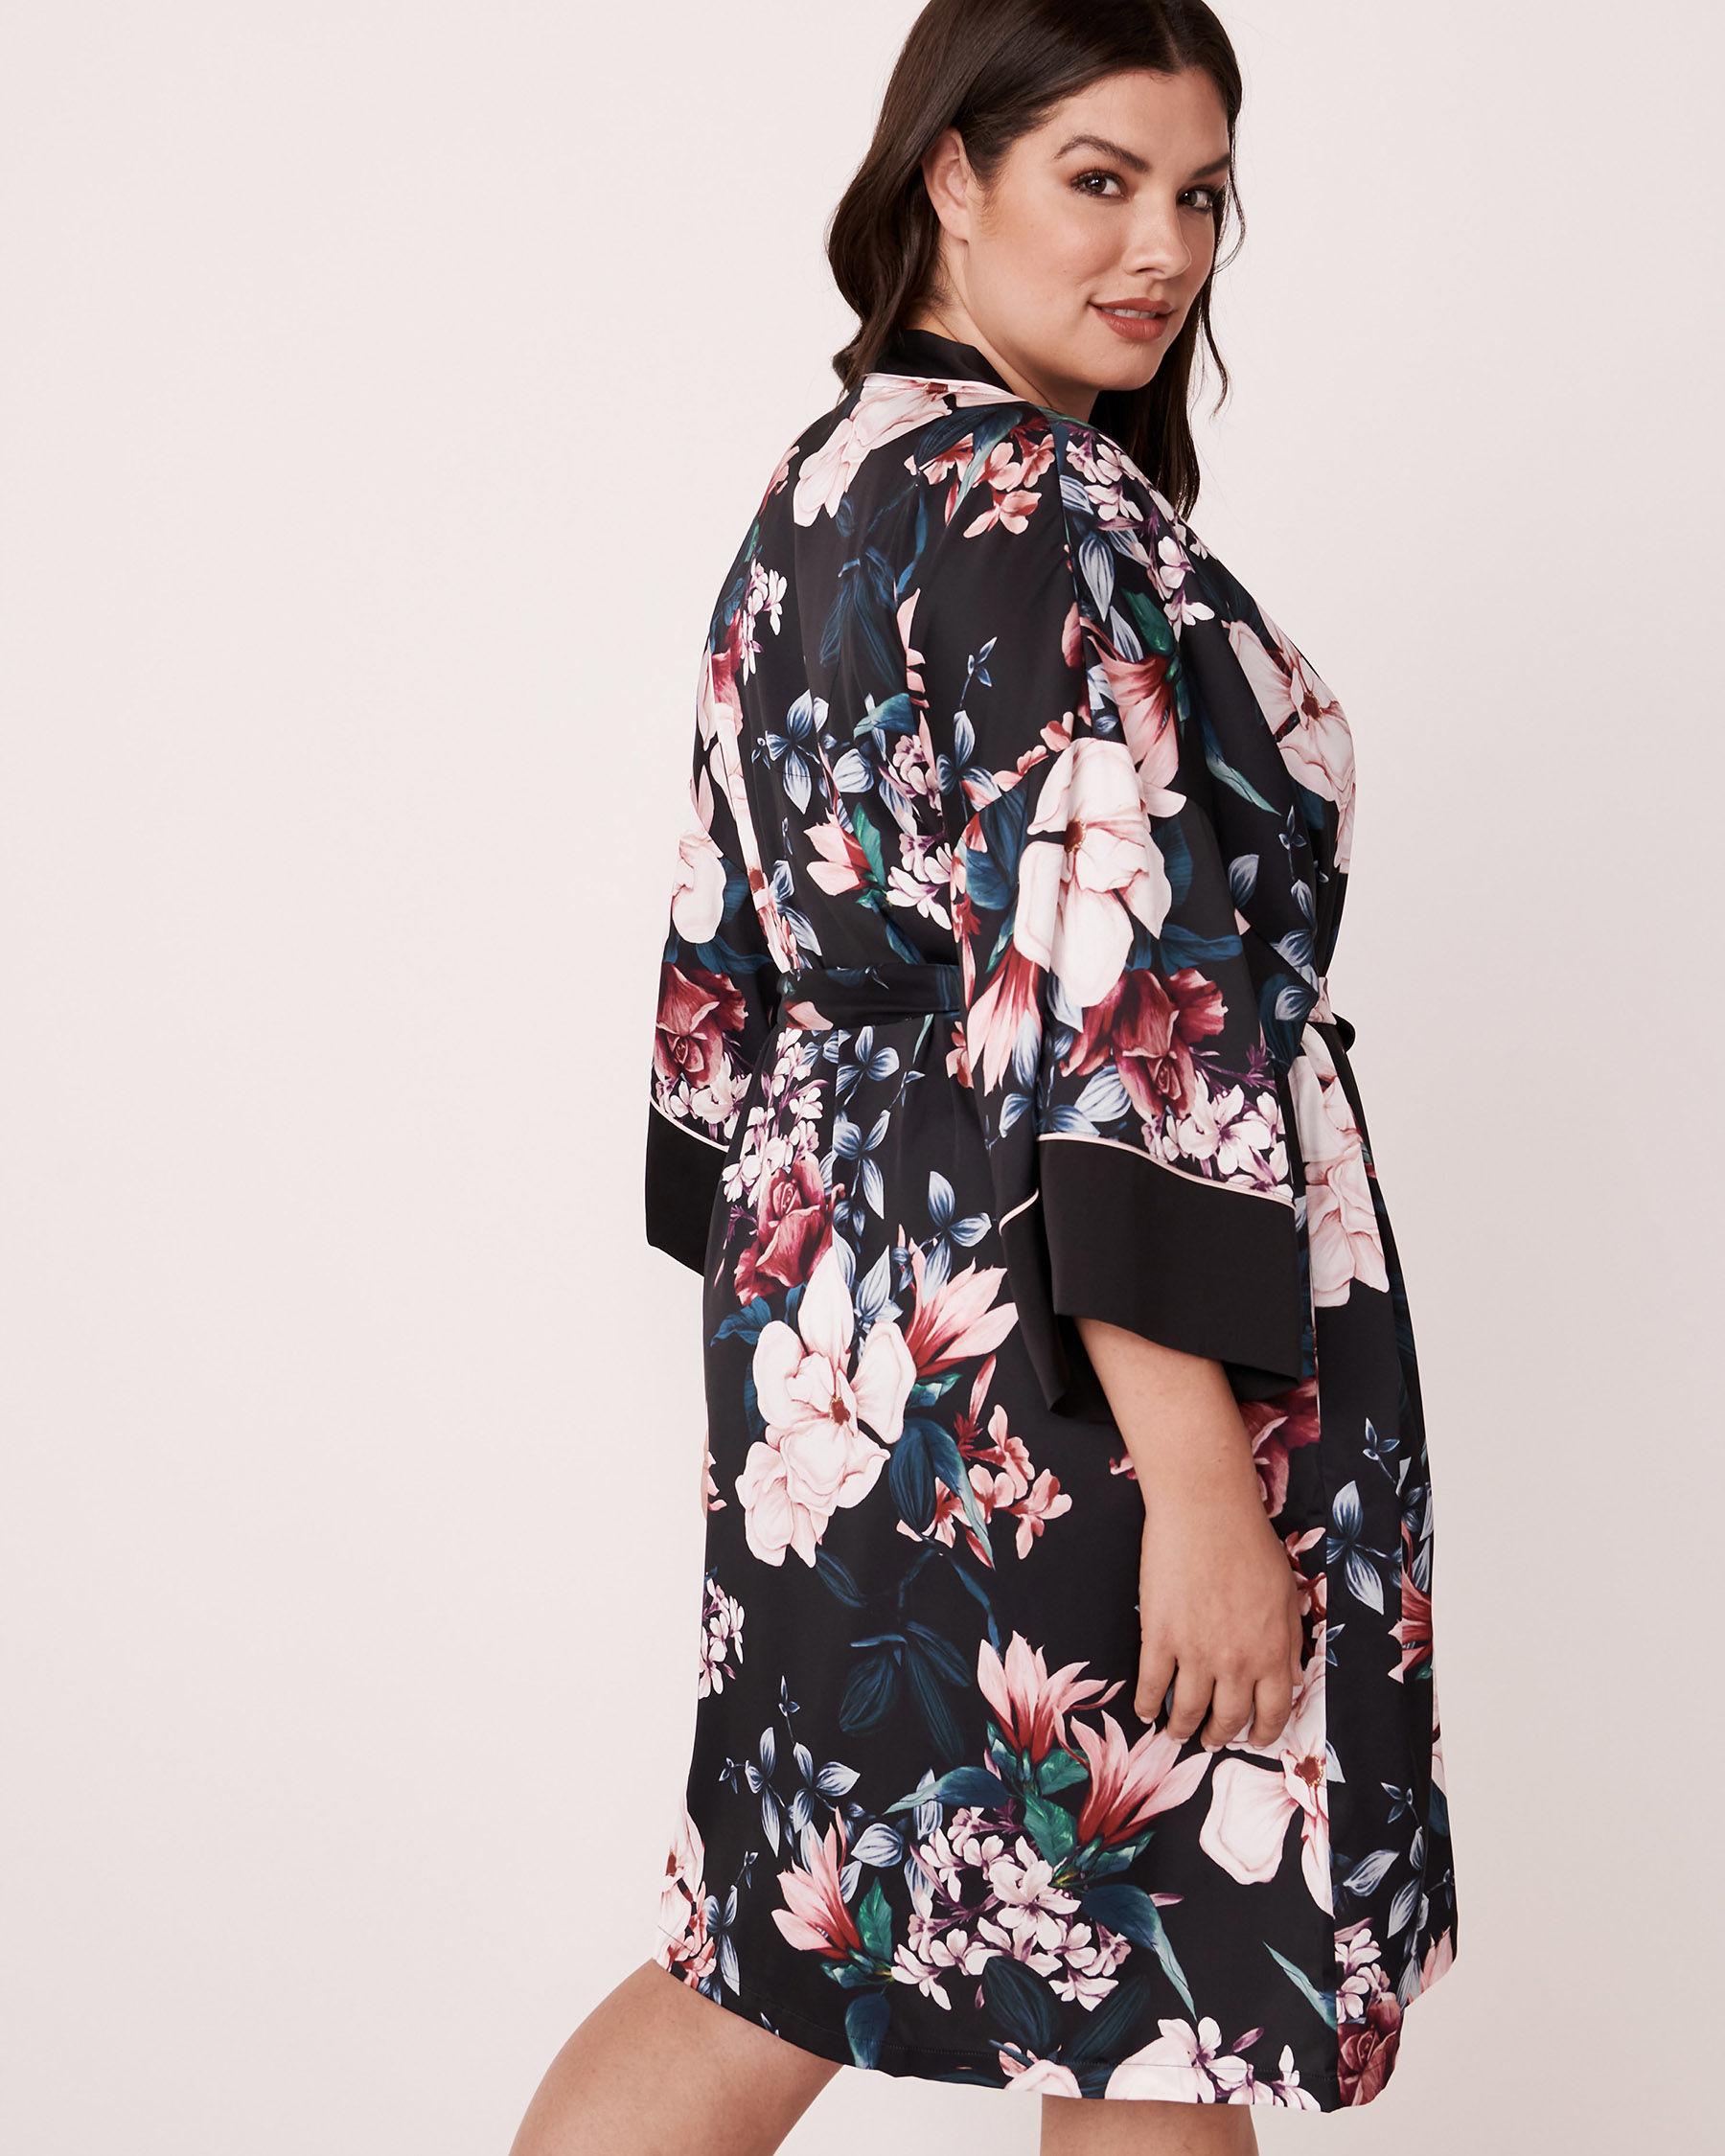 LA VIE EN ROSE Kimono en satin mat Noir 870-435-0-11 - Voir5